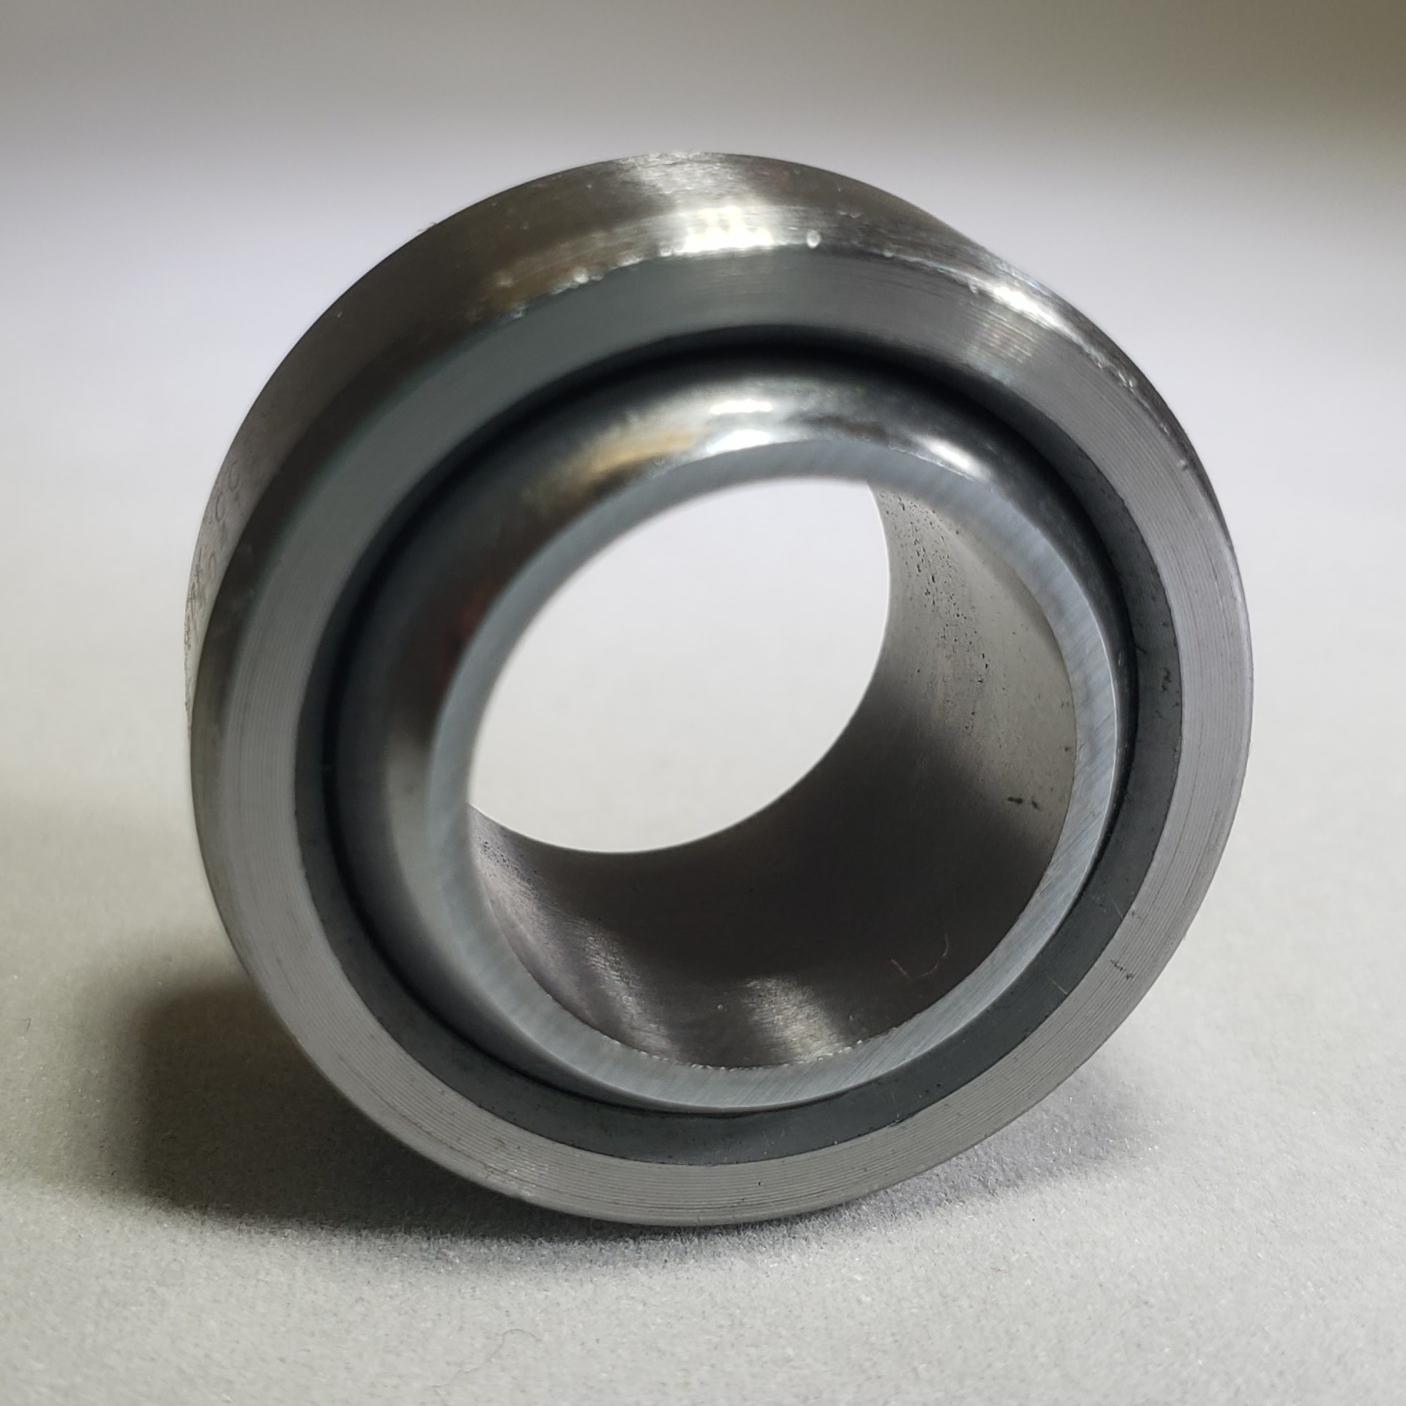 Bearing: Spherical (0.5625 Bore x 1.000 OD) COM 9/8, BK Liner, CCVI